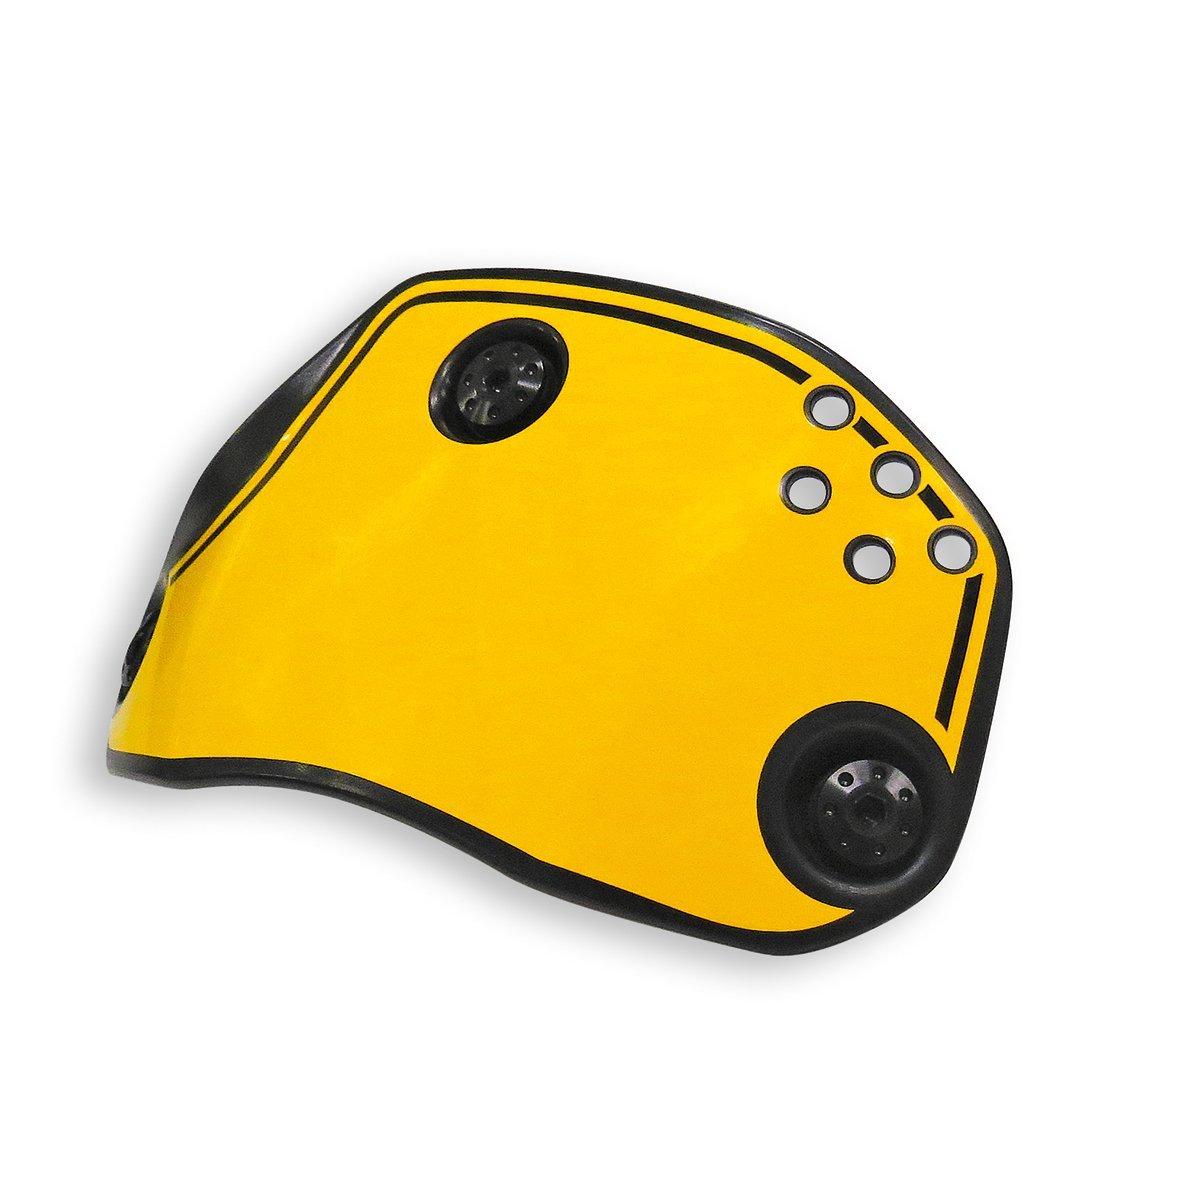 Ducati Scrambler Sport headlight fairing. 97180191A